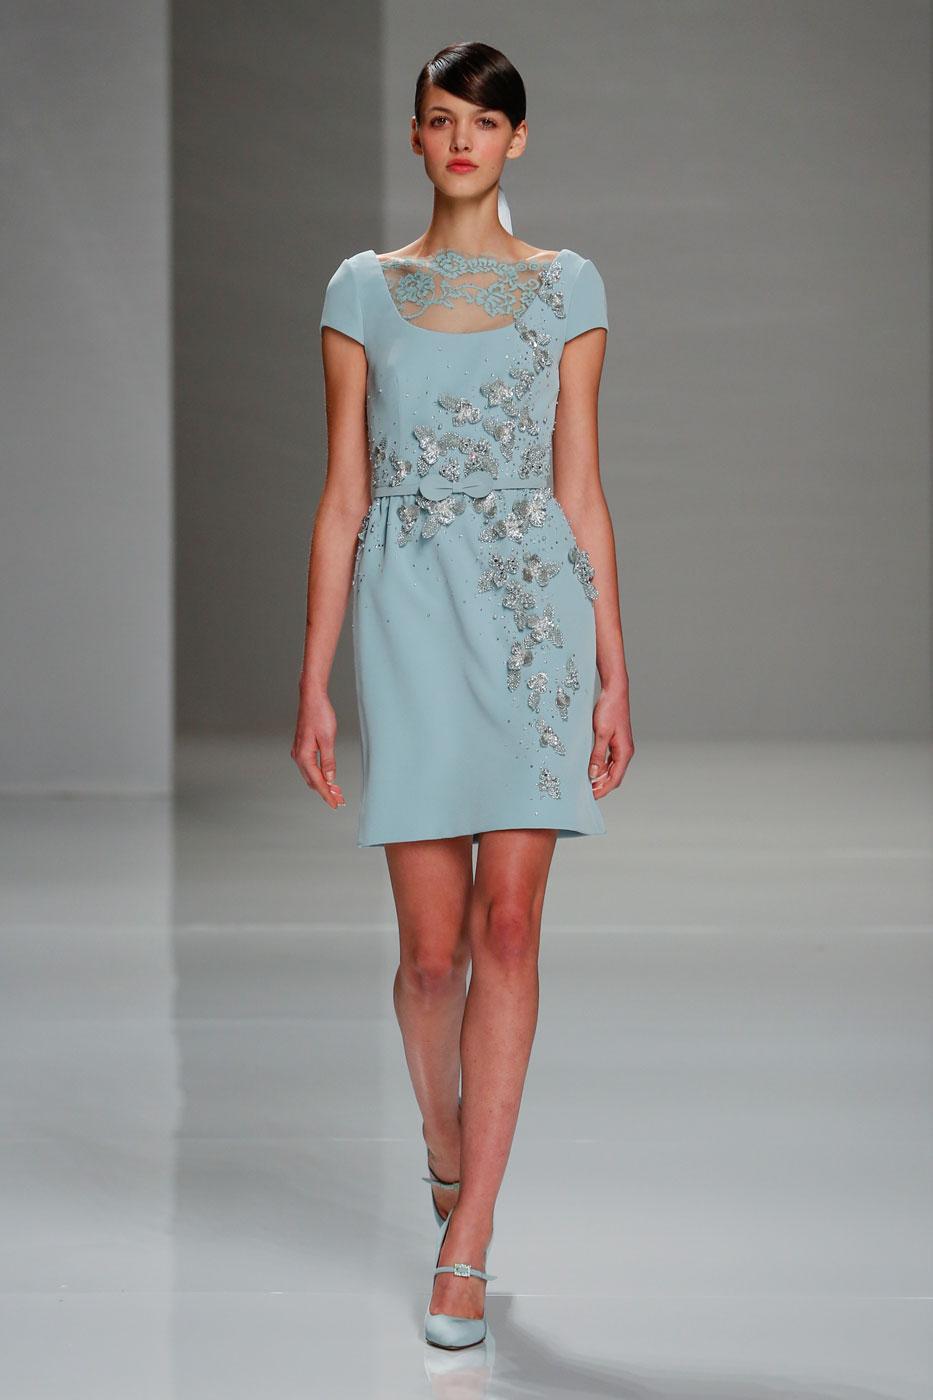 Georges-Hobeika-fashion-runway-show-haute-couture-paris-spring-2015-the-impression-27